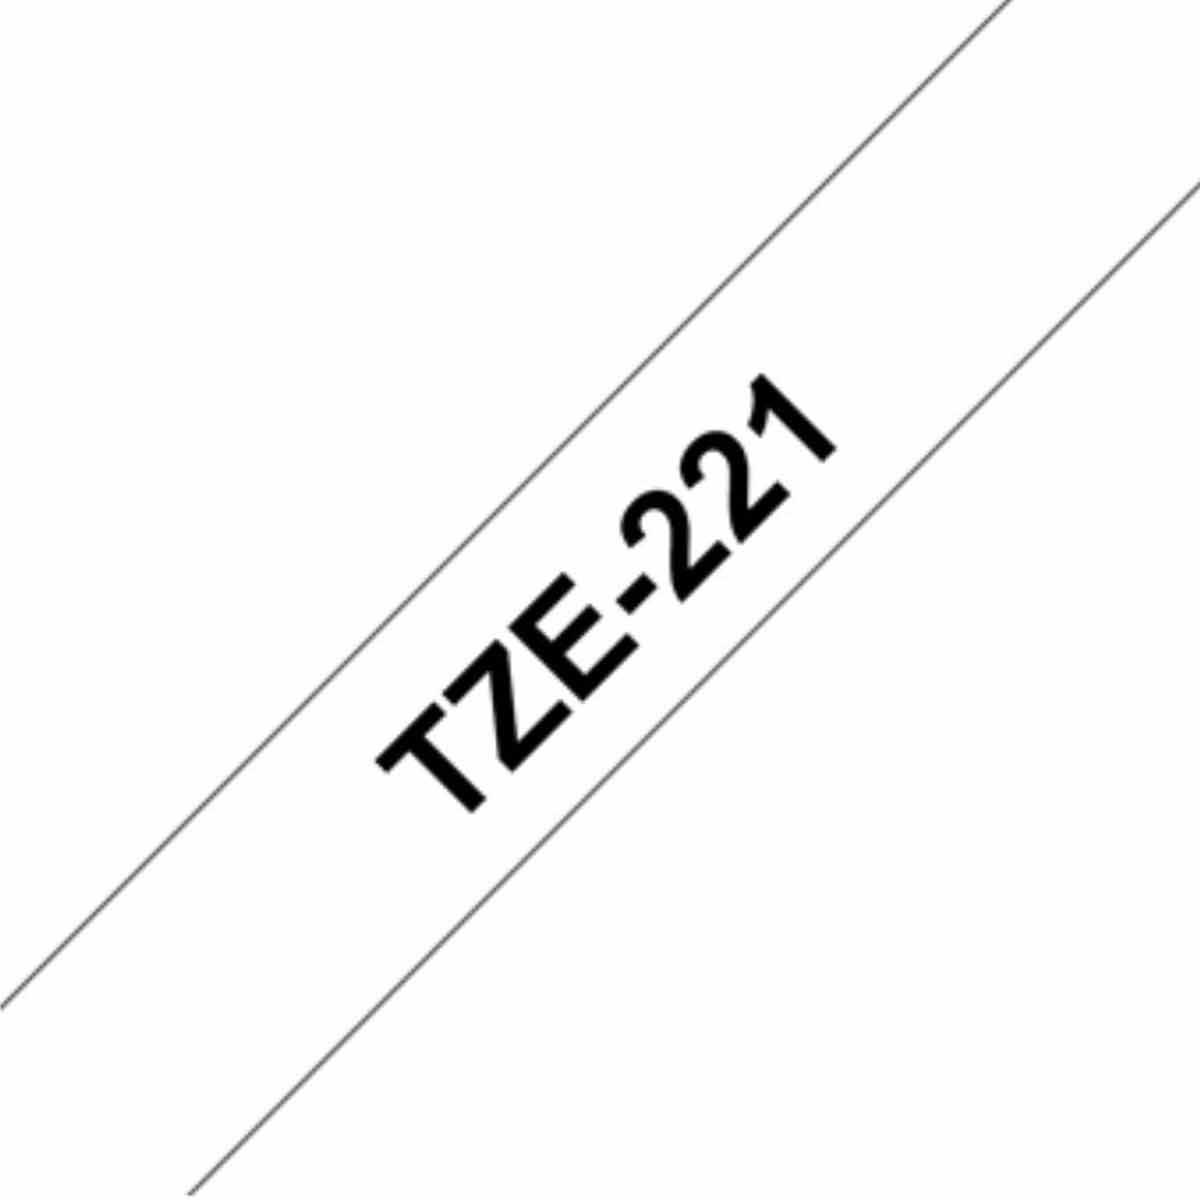 Brother TZ221 Tape 9mm, Black/White